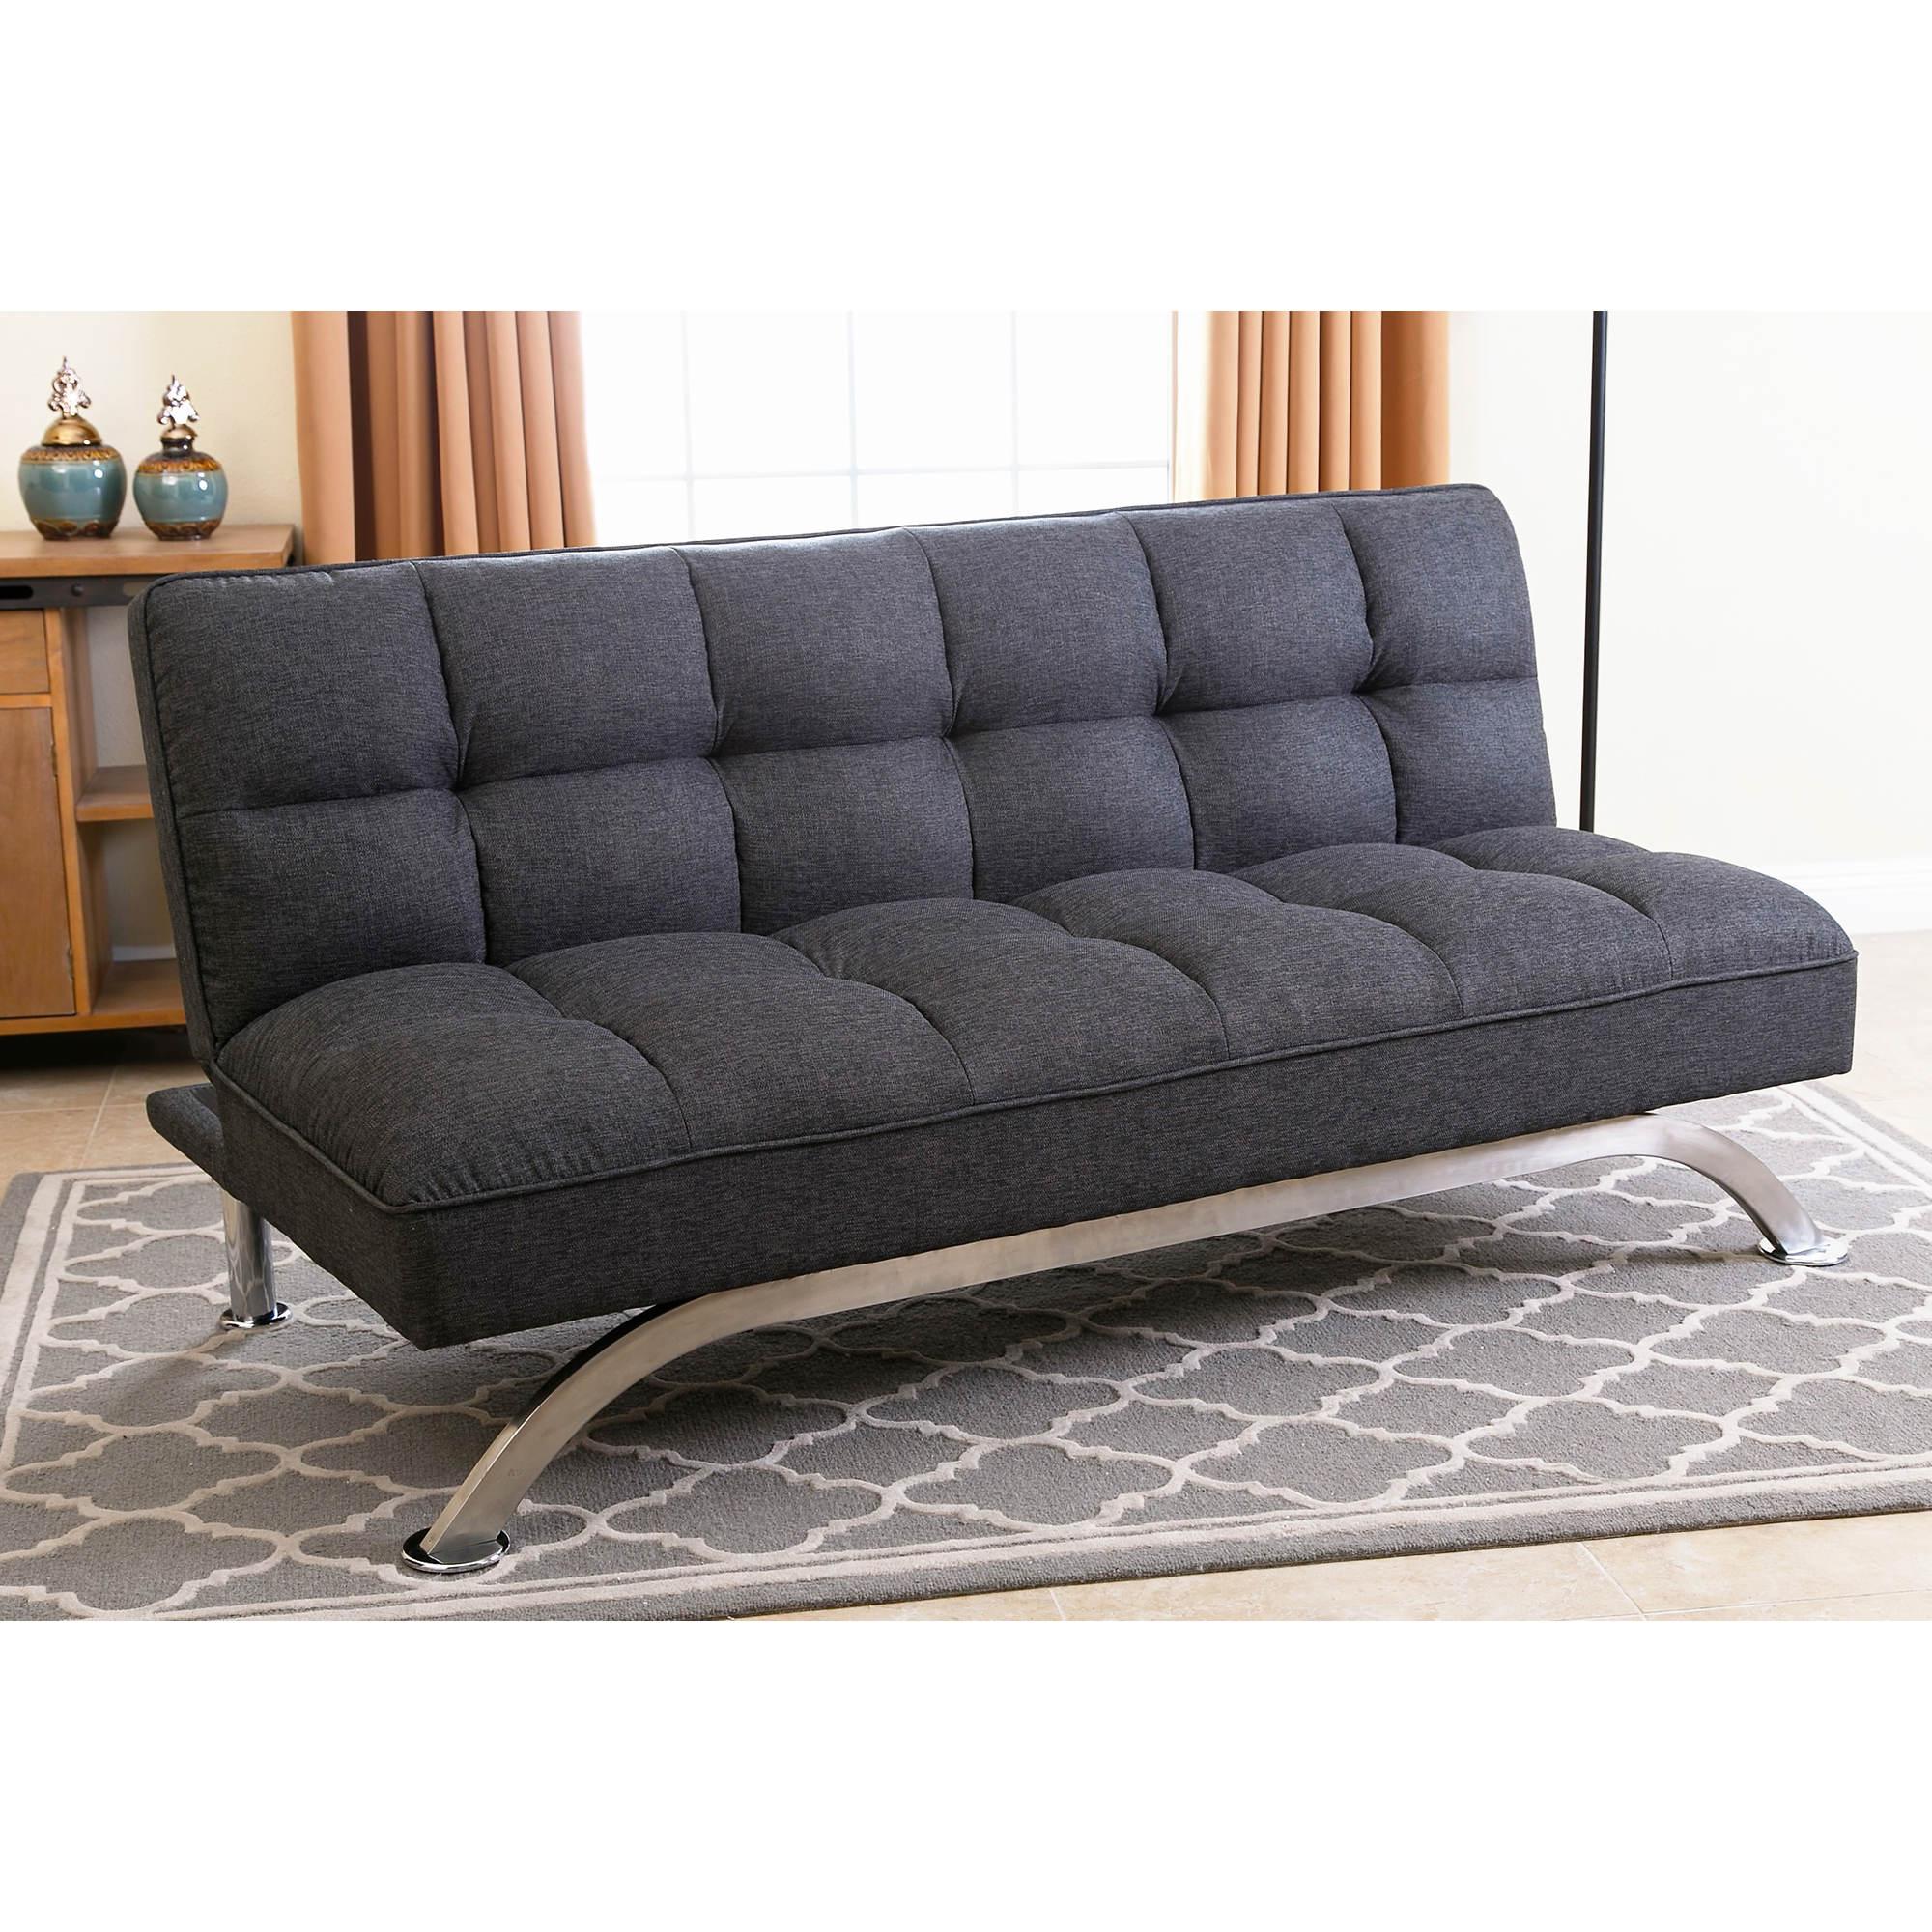 abbyson living belize click clack sofa gray bj 39 s wholesale club. Black Bedroom Furniture Sets. Home Design Ideas